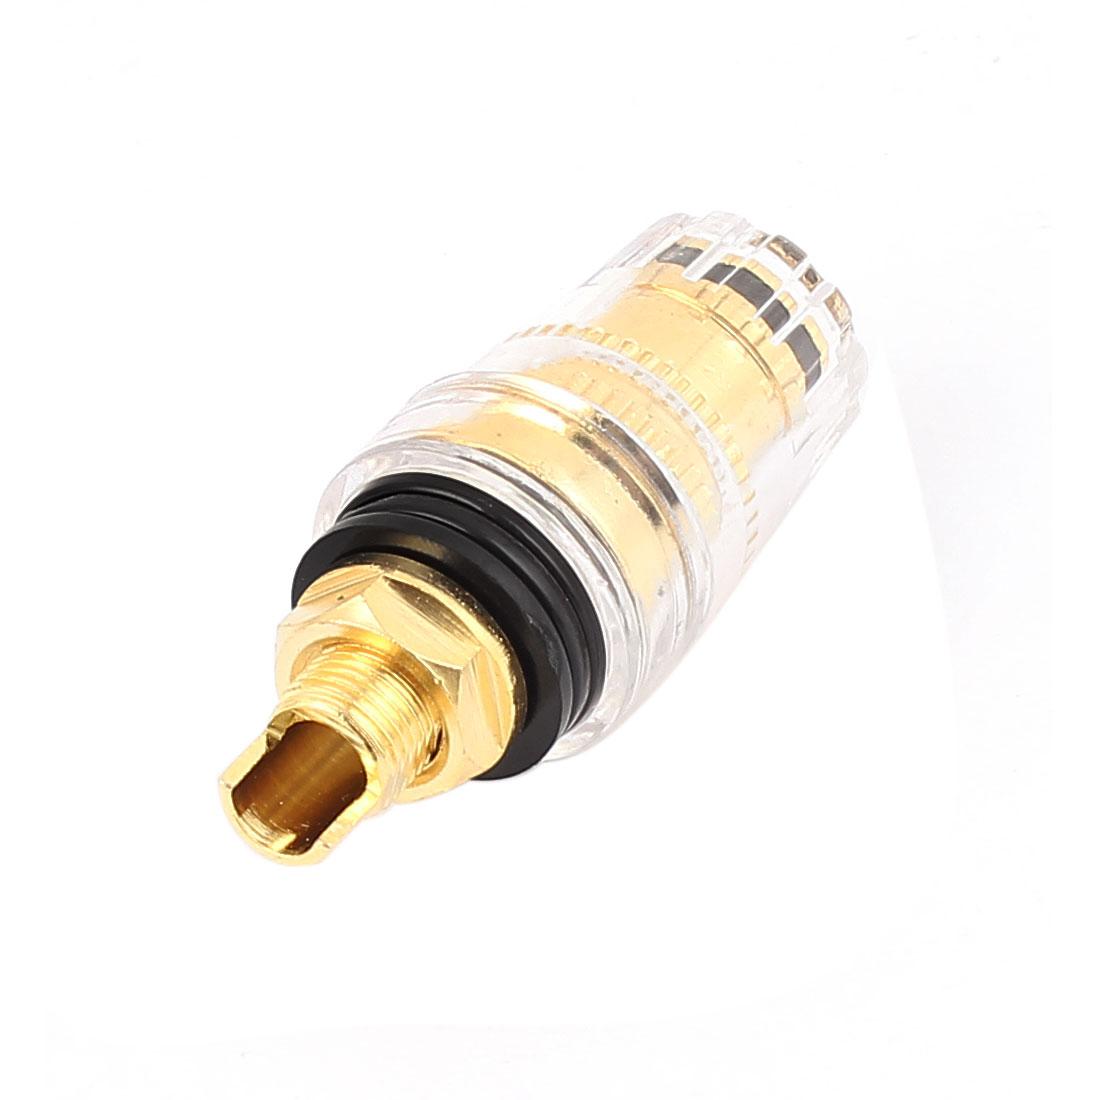 Binding Post for Amplifier Speaker 4mm Banana Socket Connector Black Gold Tone